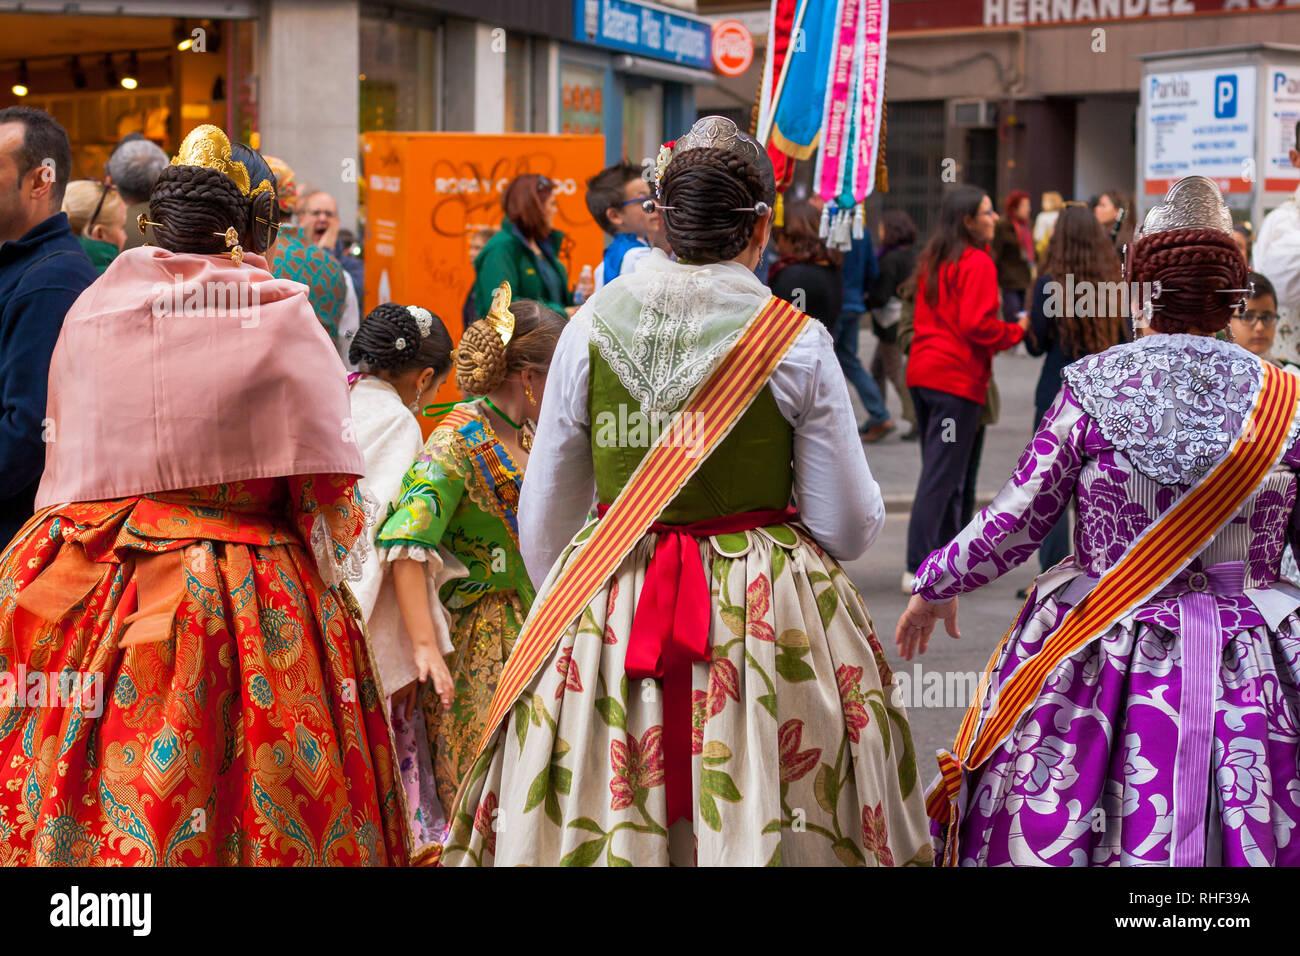 Fallas celebration, woman and girls dresses traditionally, procession. Celebration held in commemoration of Saint Joseph. Falleras. - Stock Image